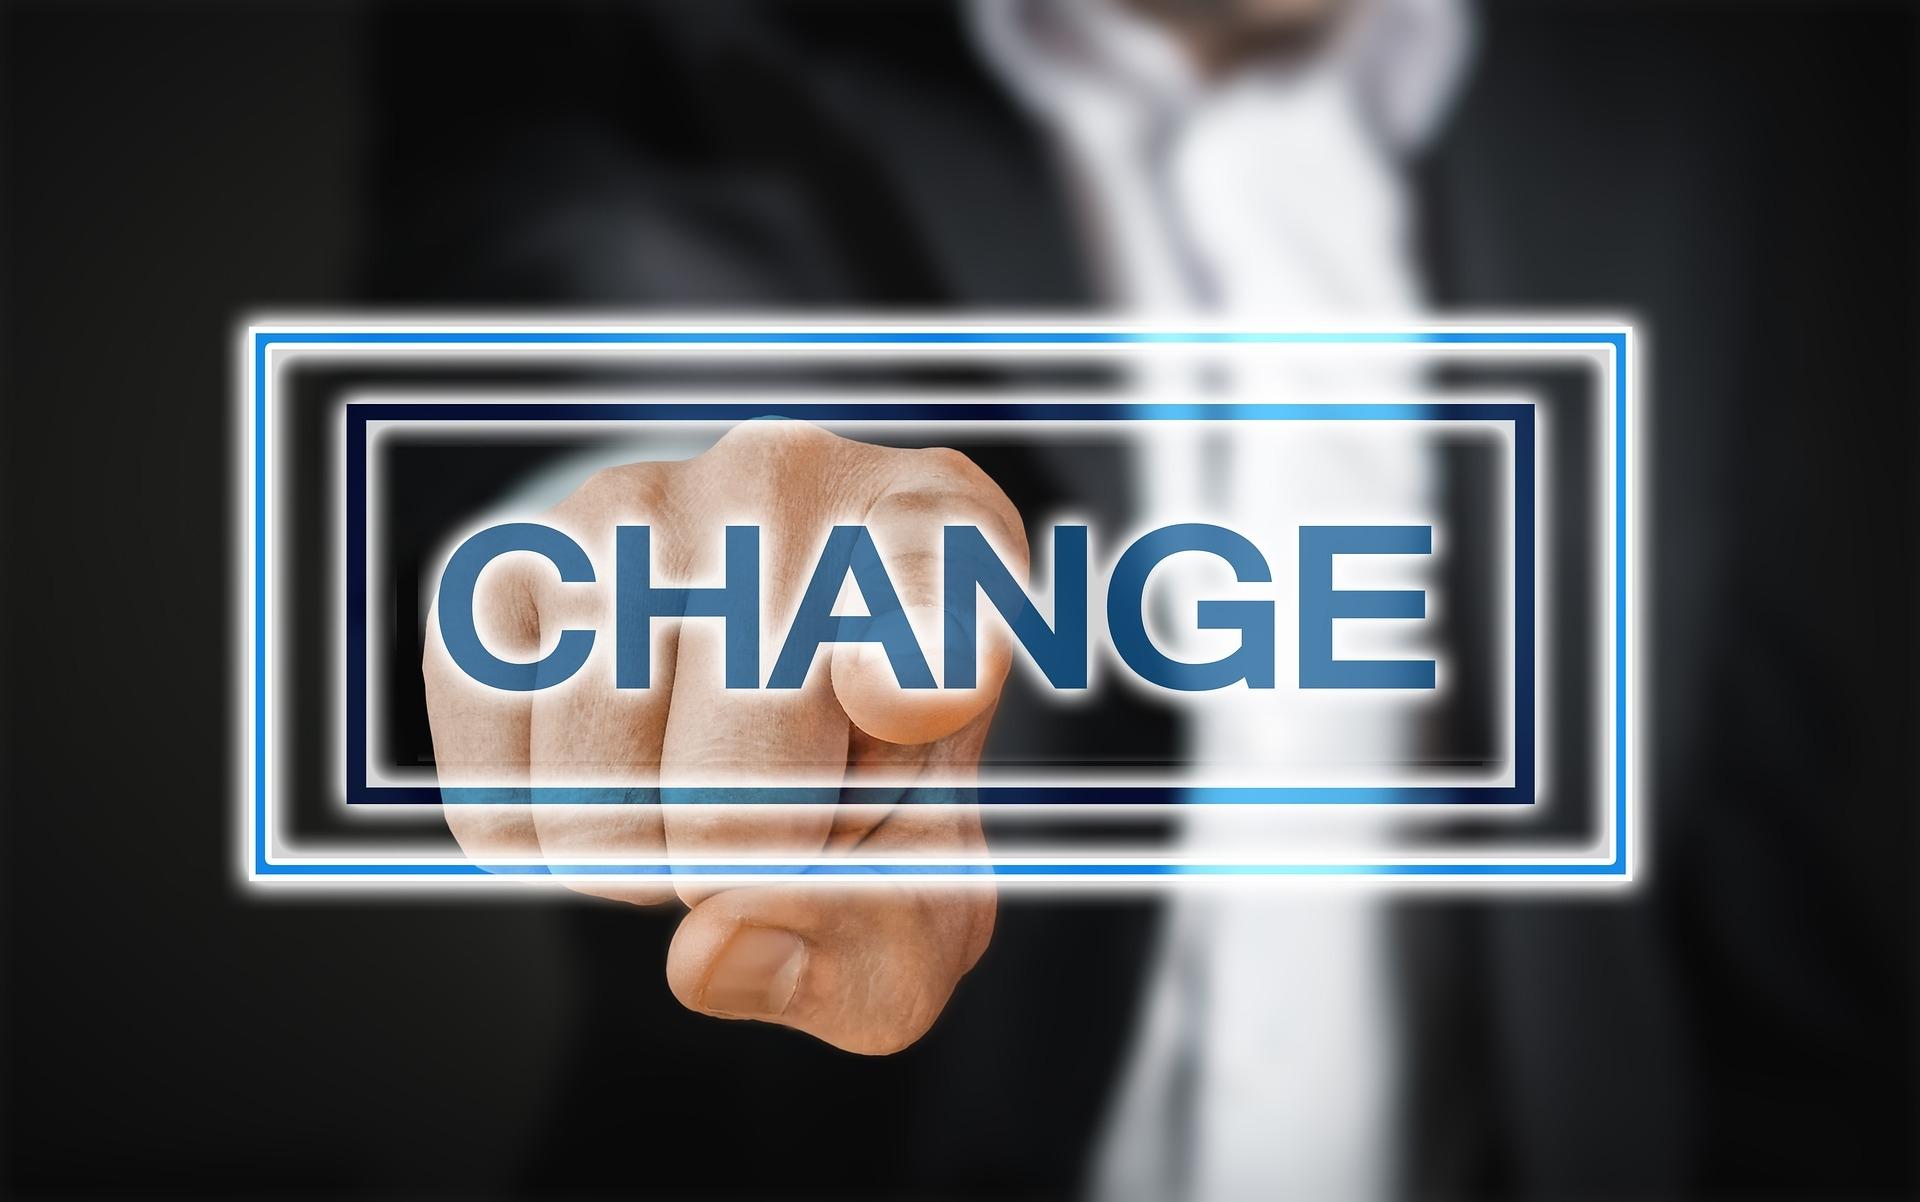 Disruptive technology drives dramatic market changes.